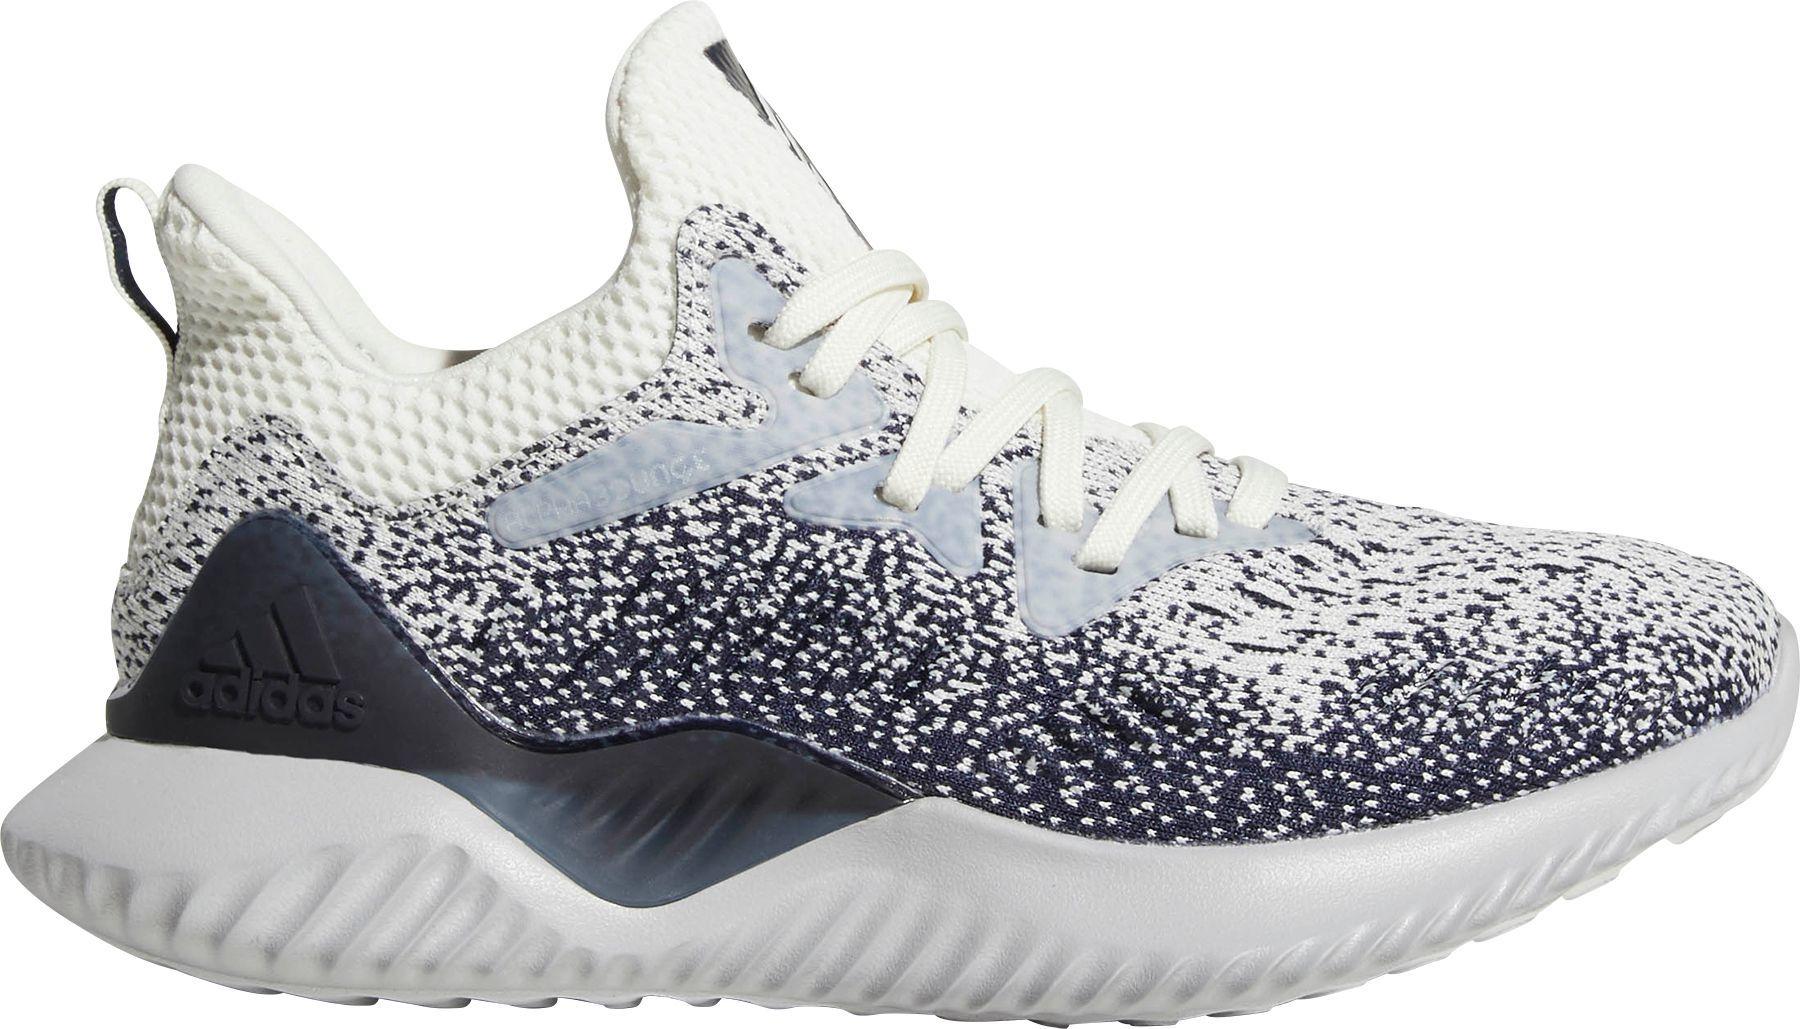 buy popular 1dfde 98544 adidas Kids Grade School alphabounce beyond Running Shoes, White Adidas  Kids, Adidas Men